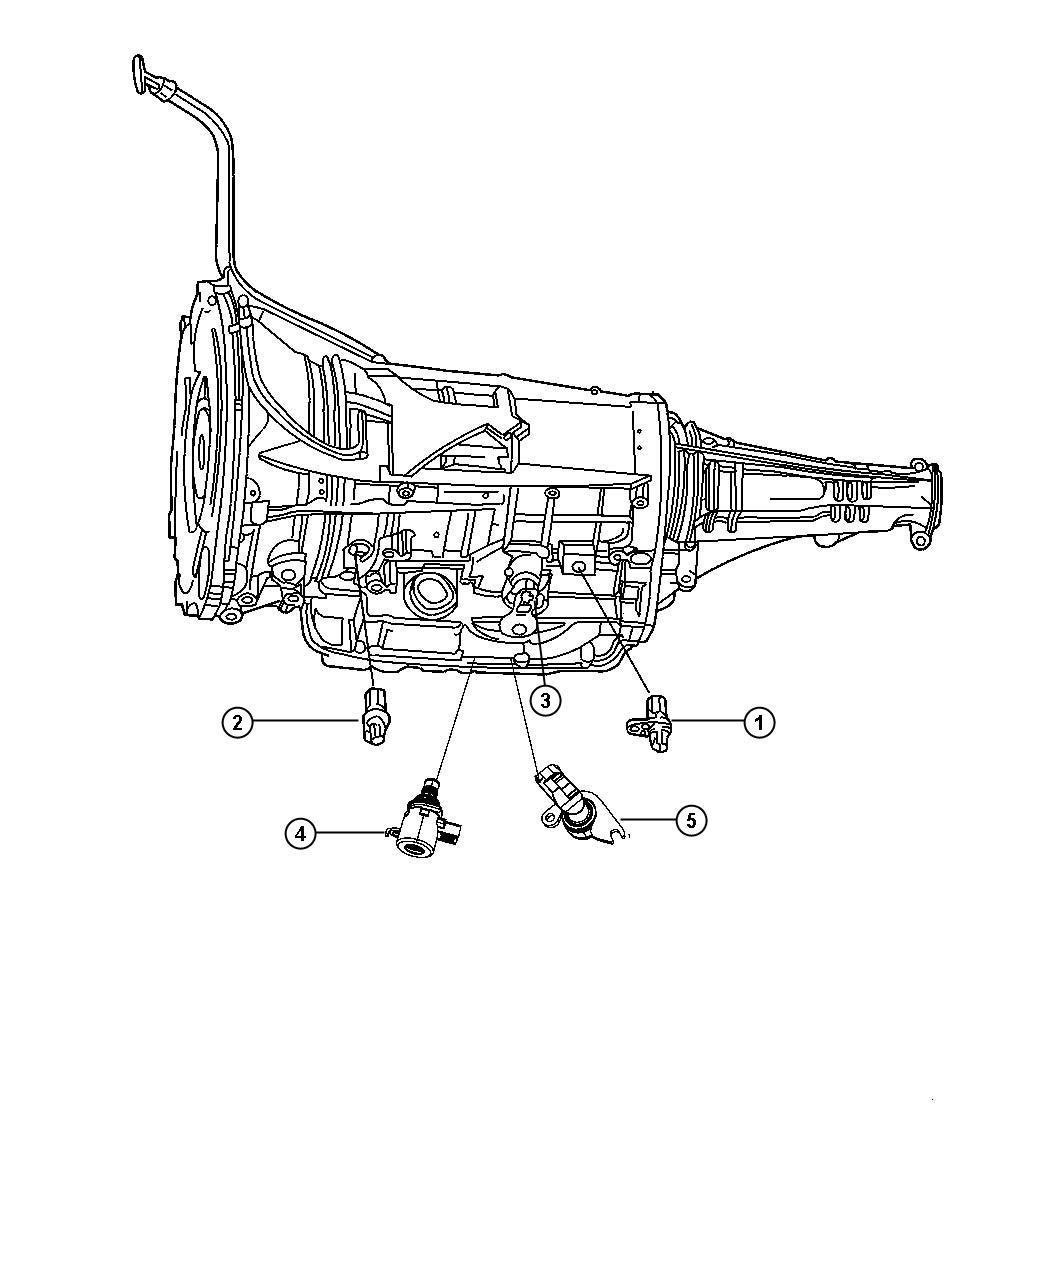 2010 Jeep Wrangler Sensor, solenoid. Trans variable force